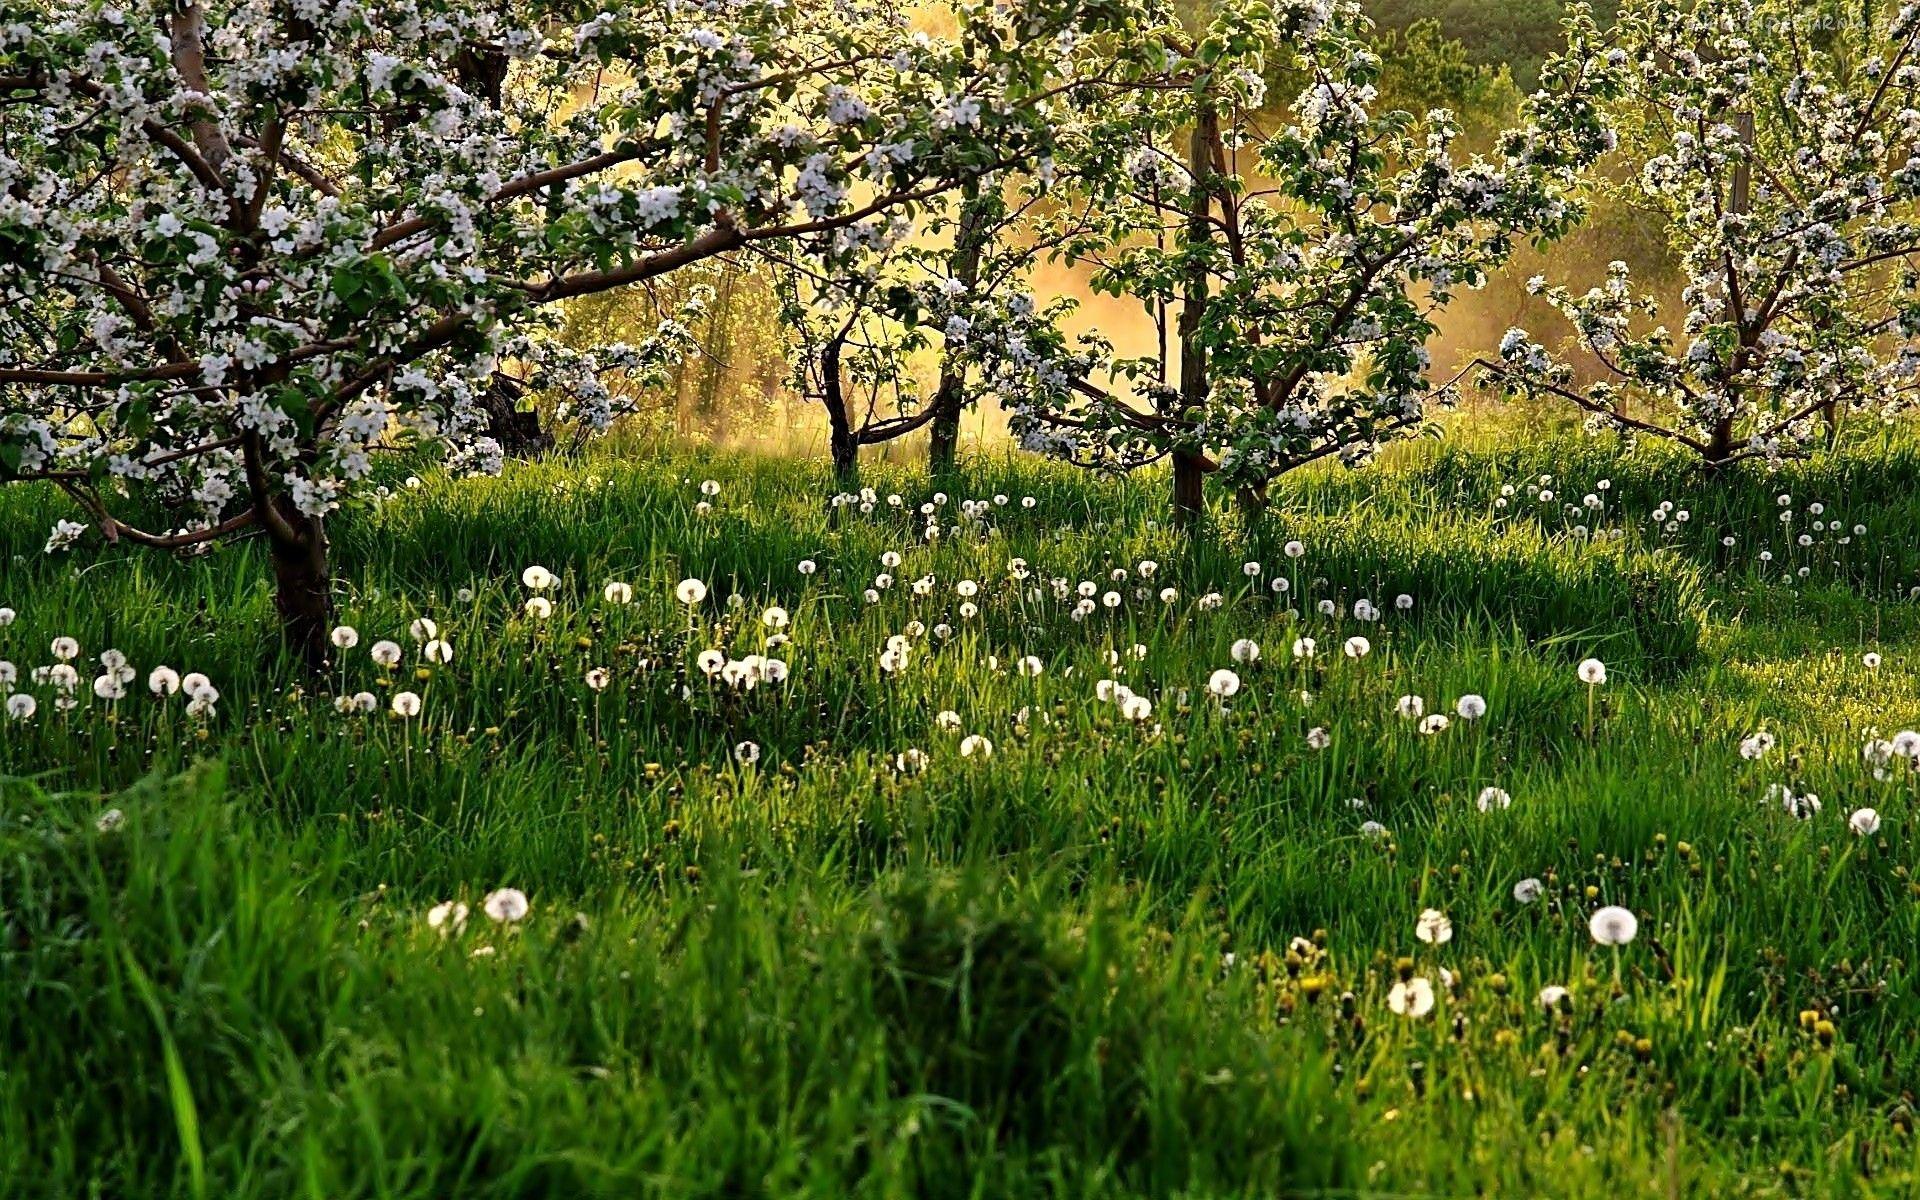 Wiosna Kwitnace Drzewa Laka Dmuchawce Spring Wallpaper Blooming Trees Dandelion Wallpaper